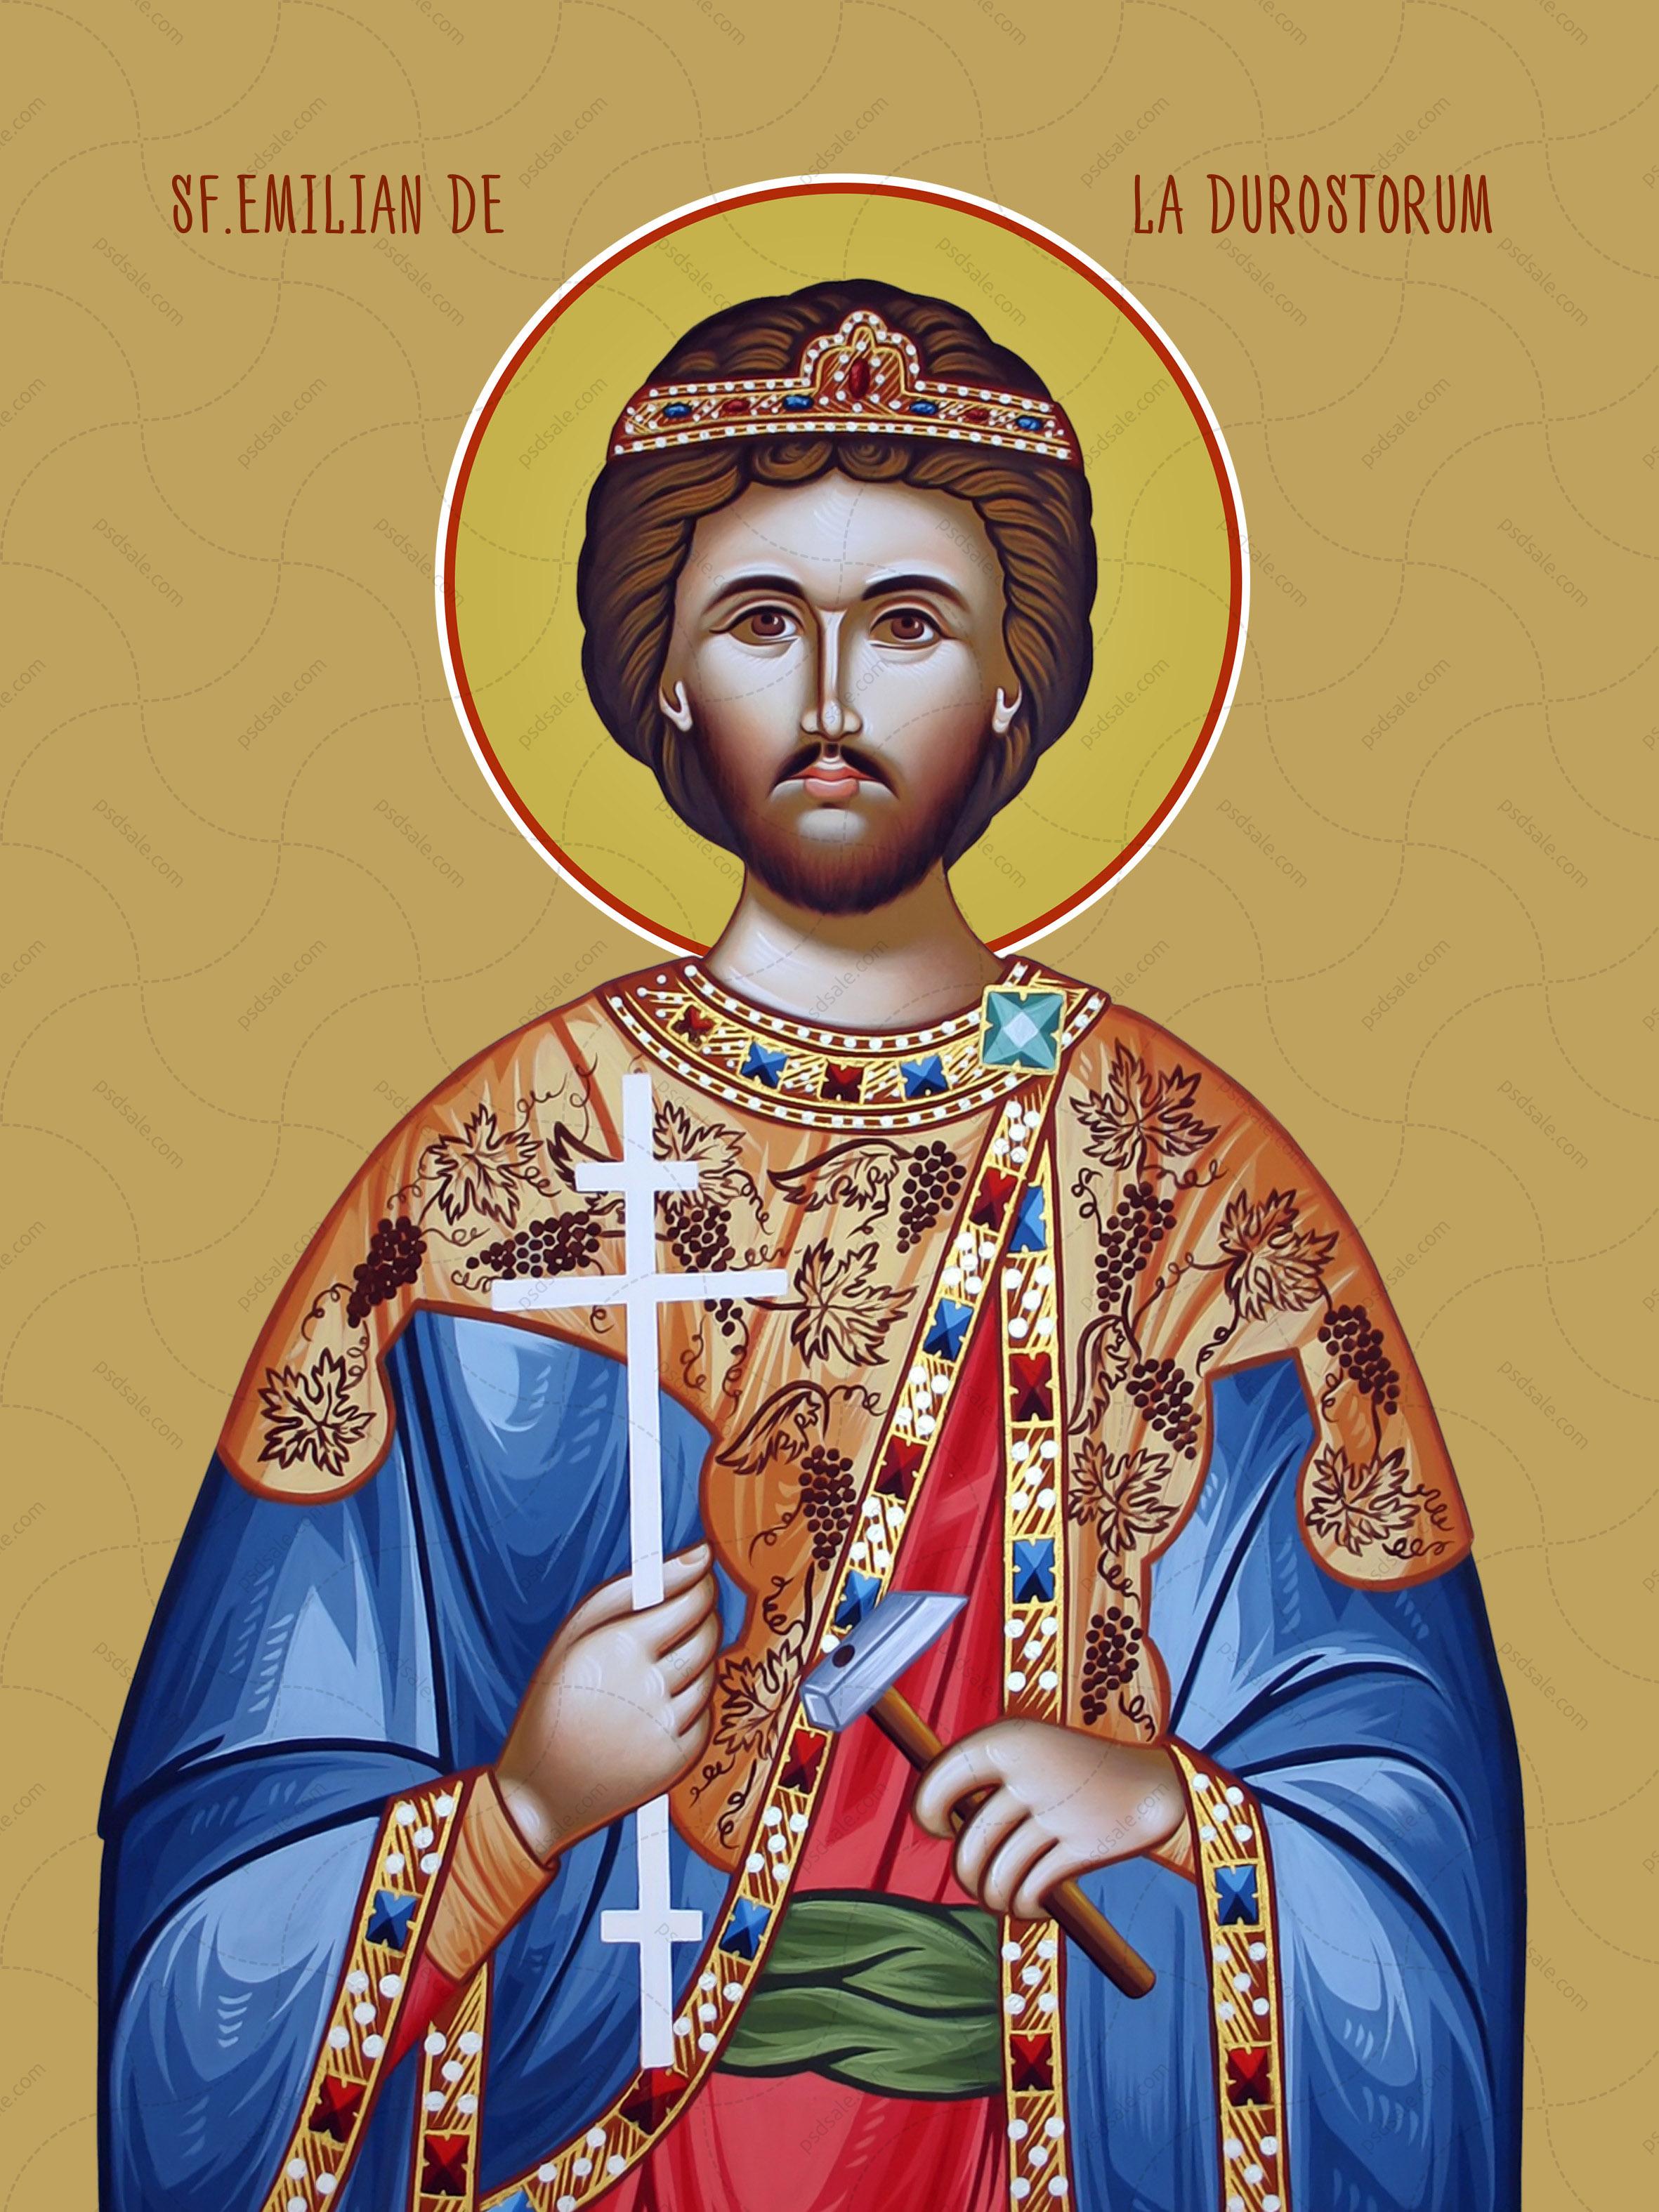 Емилиан Доростольский / Sf.Emilian de la Durostorum